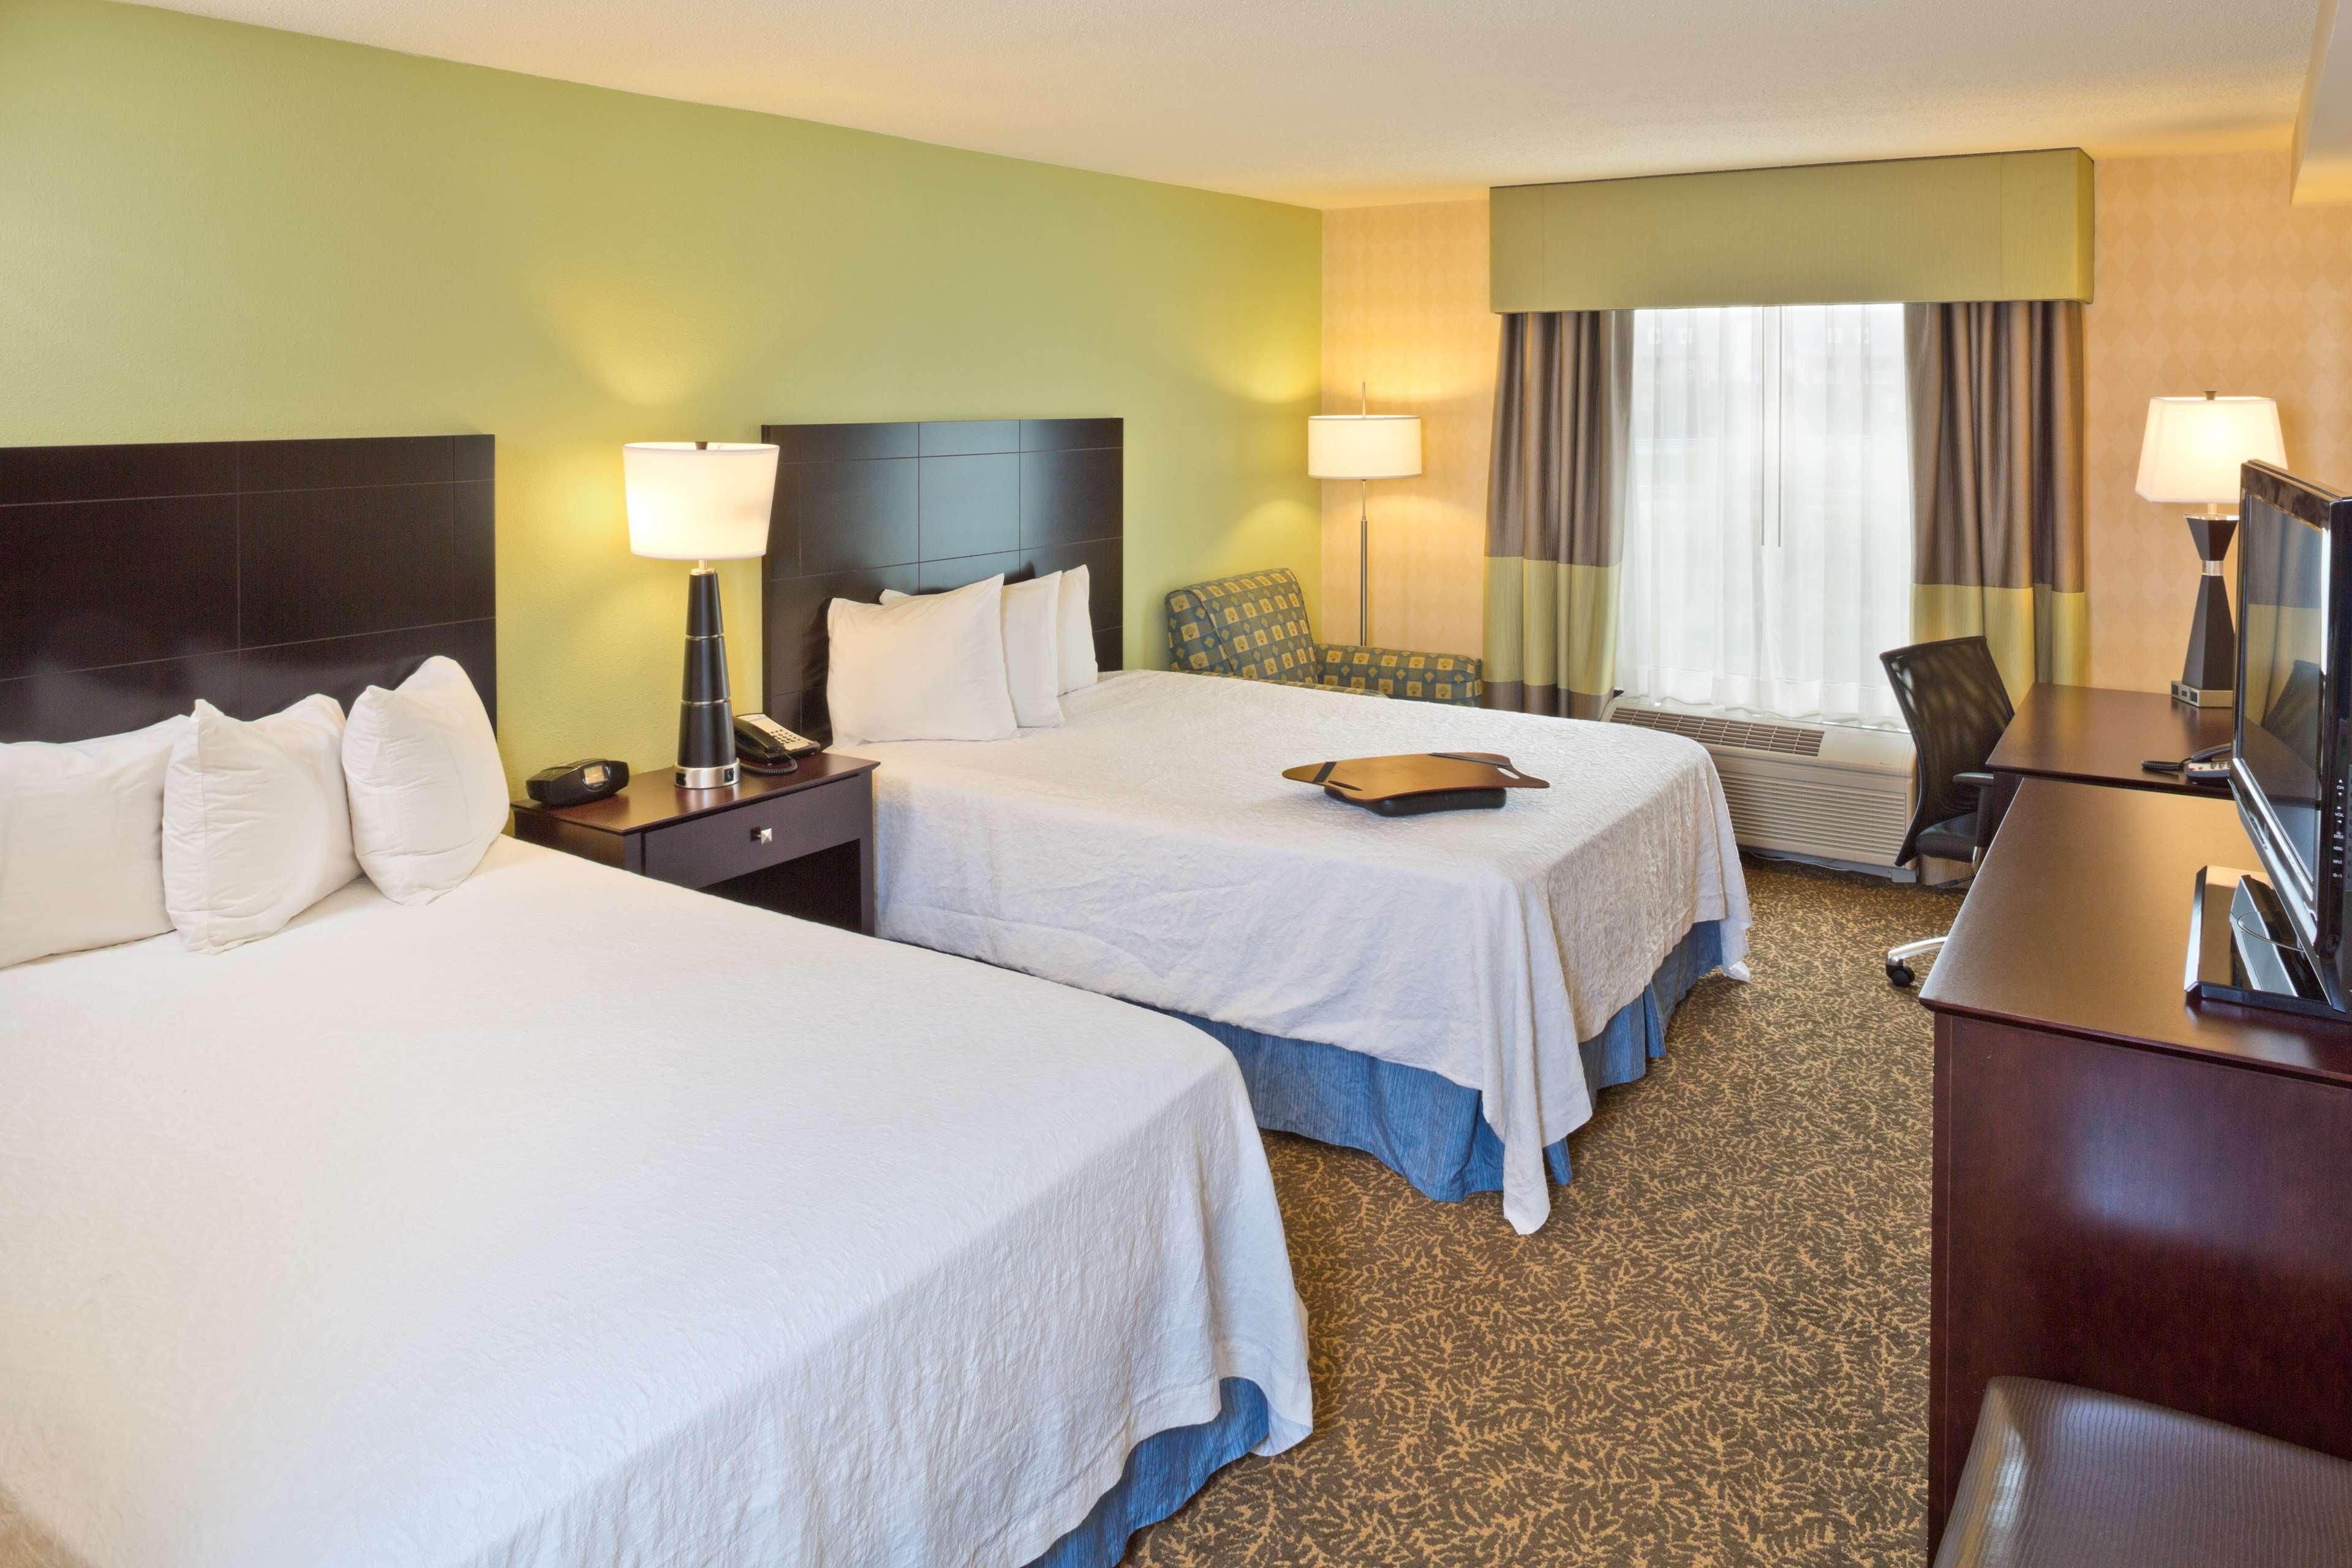 Hampton Inn & Suites Arundel Mills/Baltimore image 10